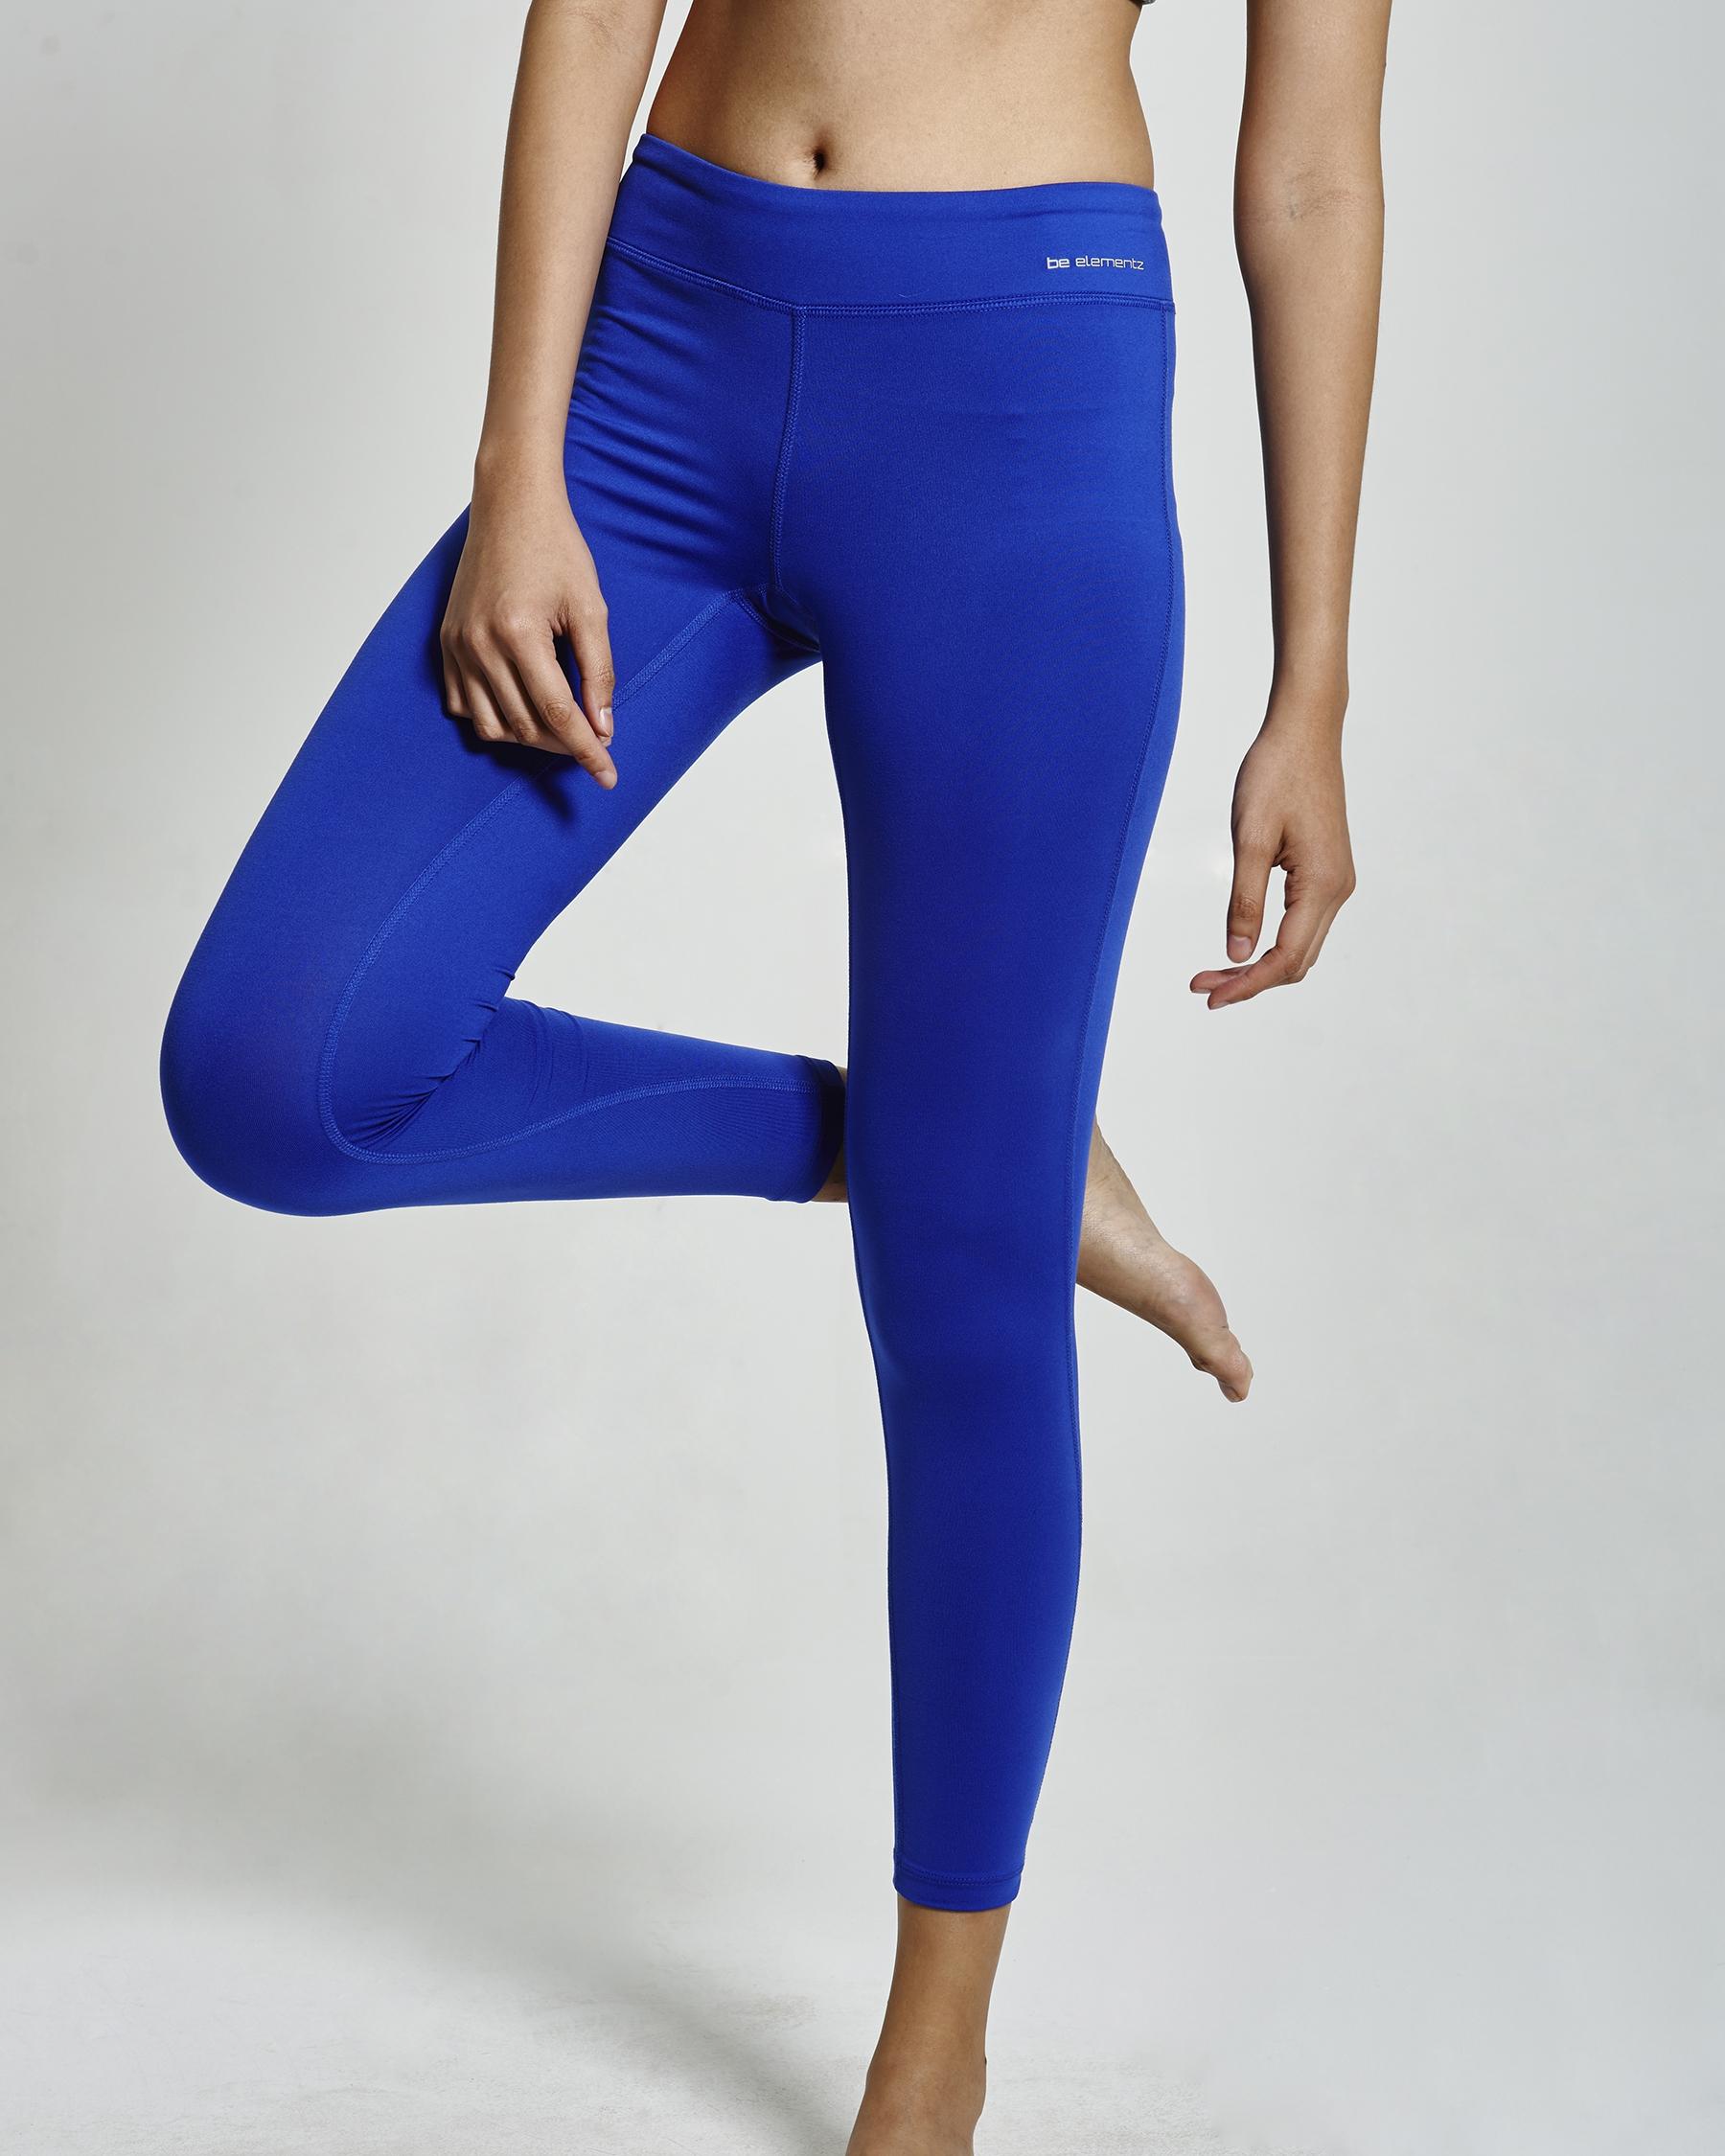 f8ecf0883eb0f2 Cobalt Blue Yoga Pants &HI35 – Advancedmassagebysara